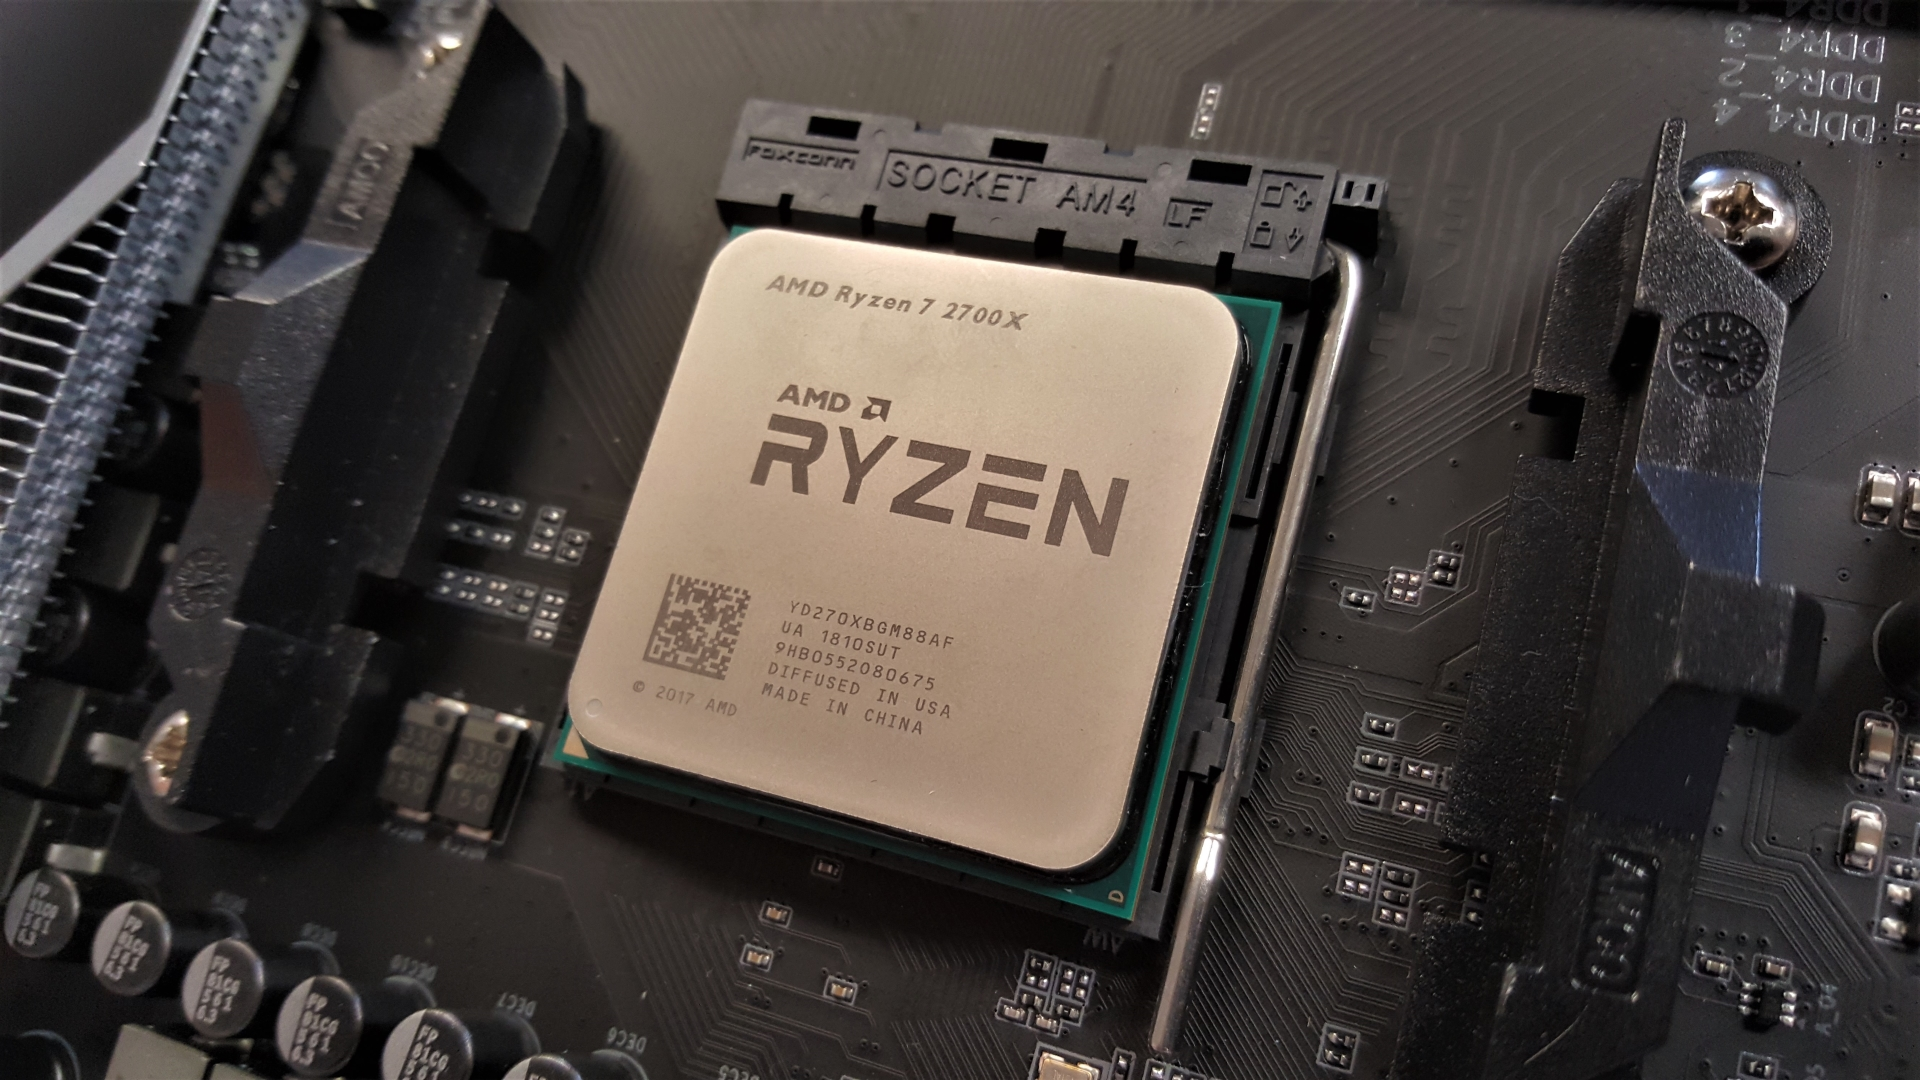 AMD Ryzen 7 2700X review: the Intel Coffee Lake CPU killer